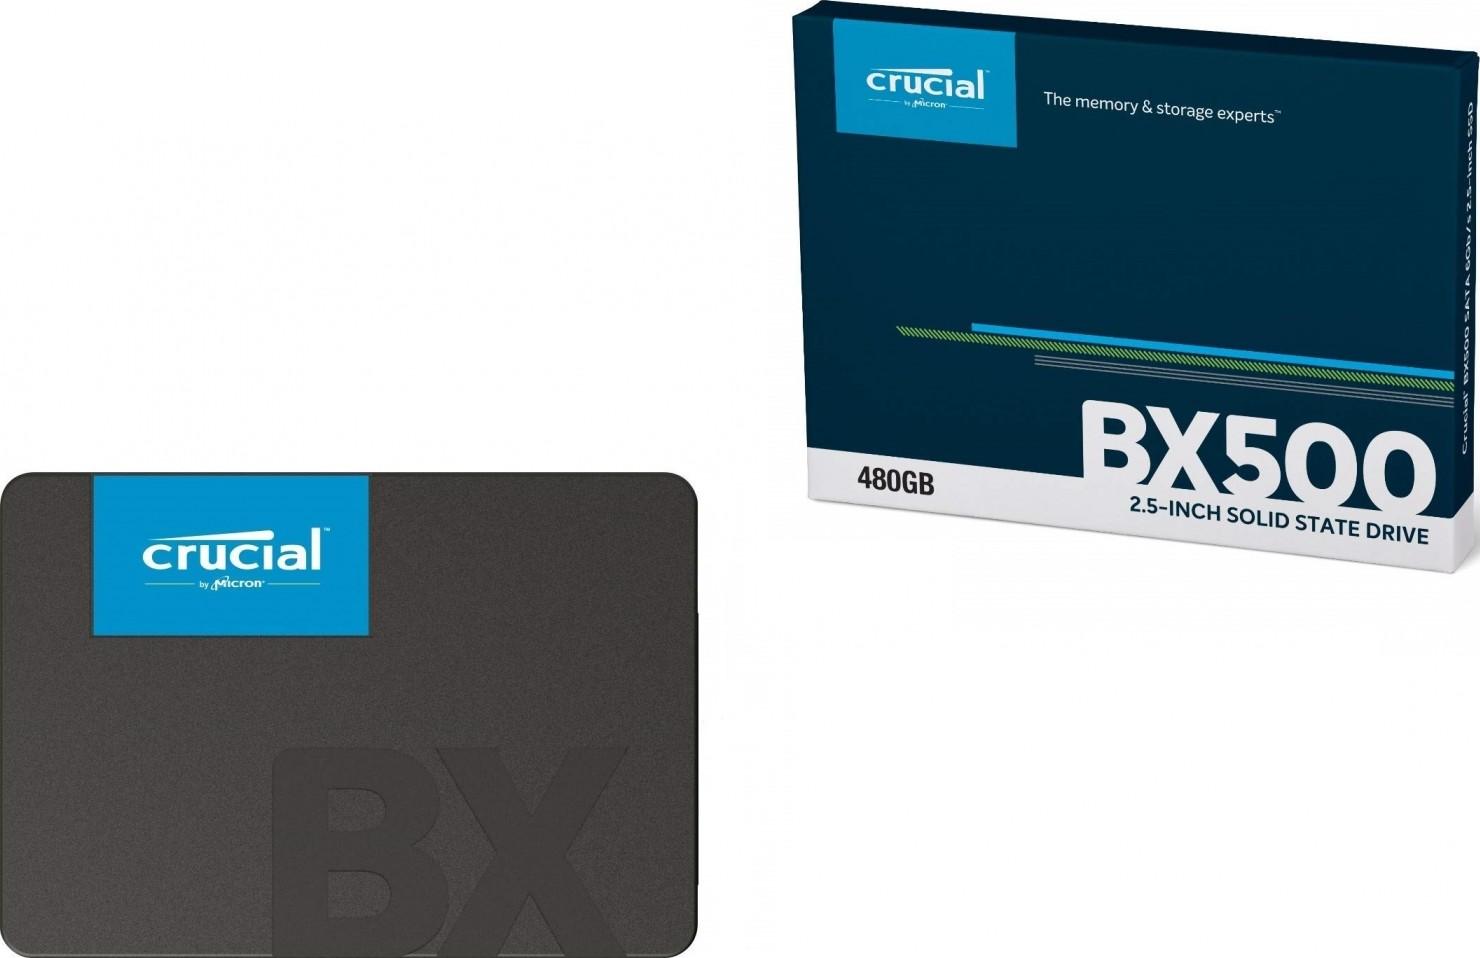 Crucial BX500 480GB 3D NAND SATA 2 5-inch Internal SSD   CT480BX500SSD1